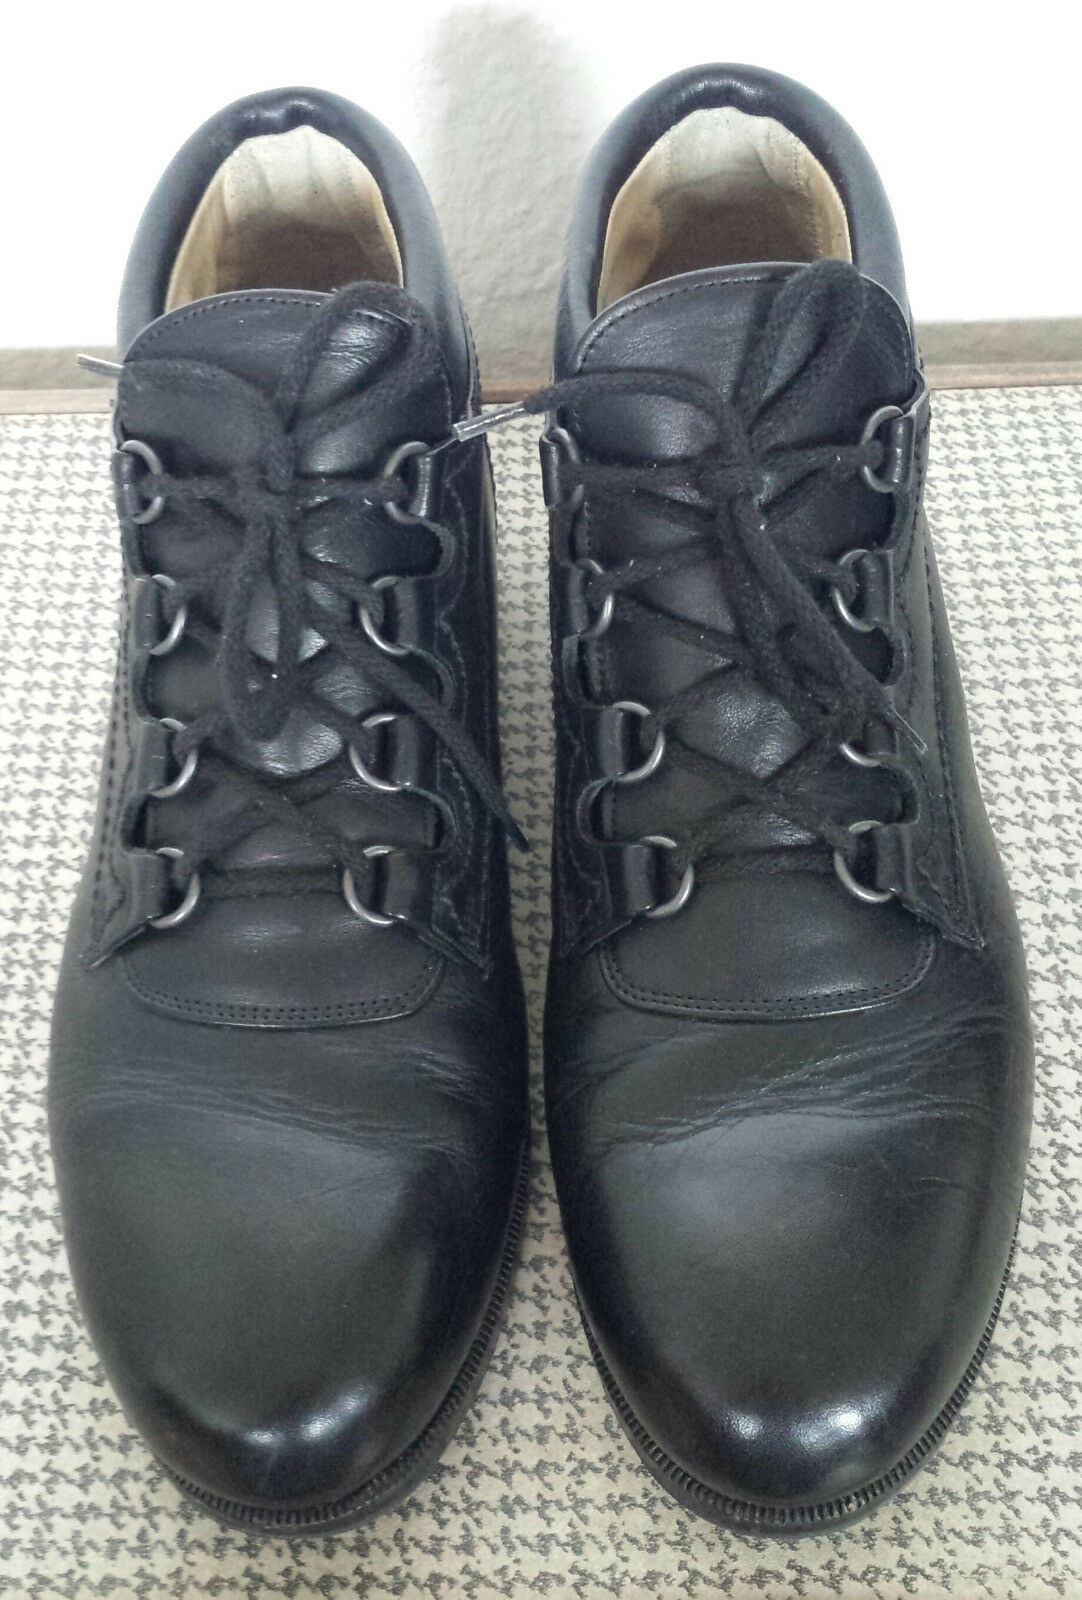 Unikat Handmade Orthopädische Lederschuhe Leder schwarz Schuhmacher